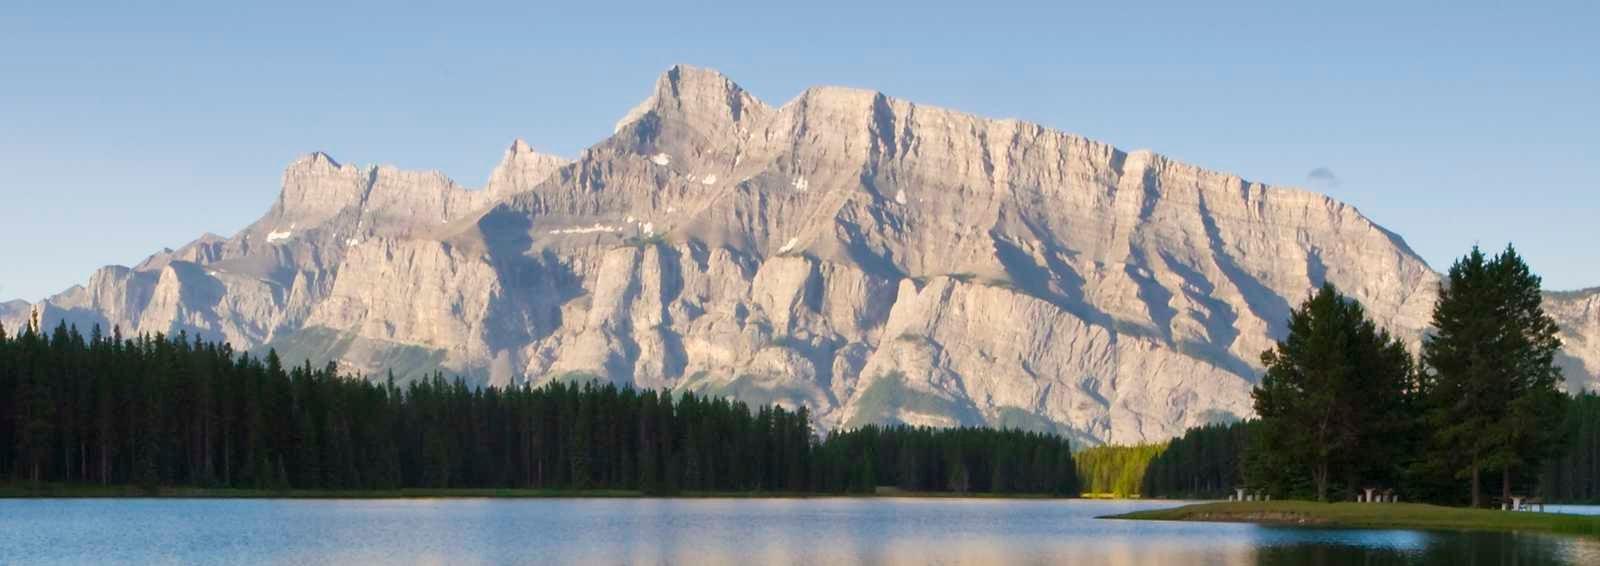 Jack Lake, Banff National Park, Canada